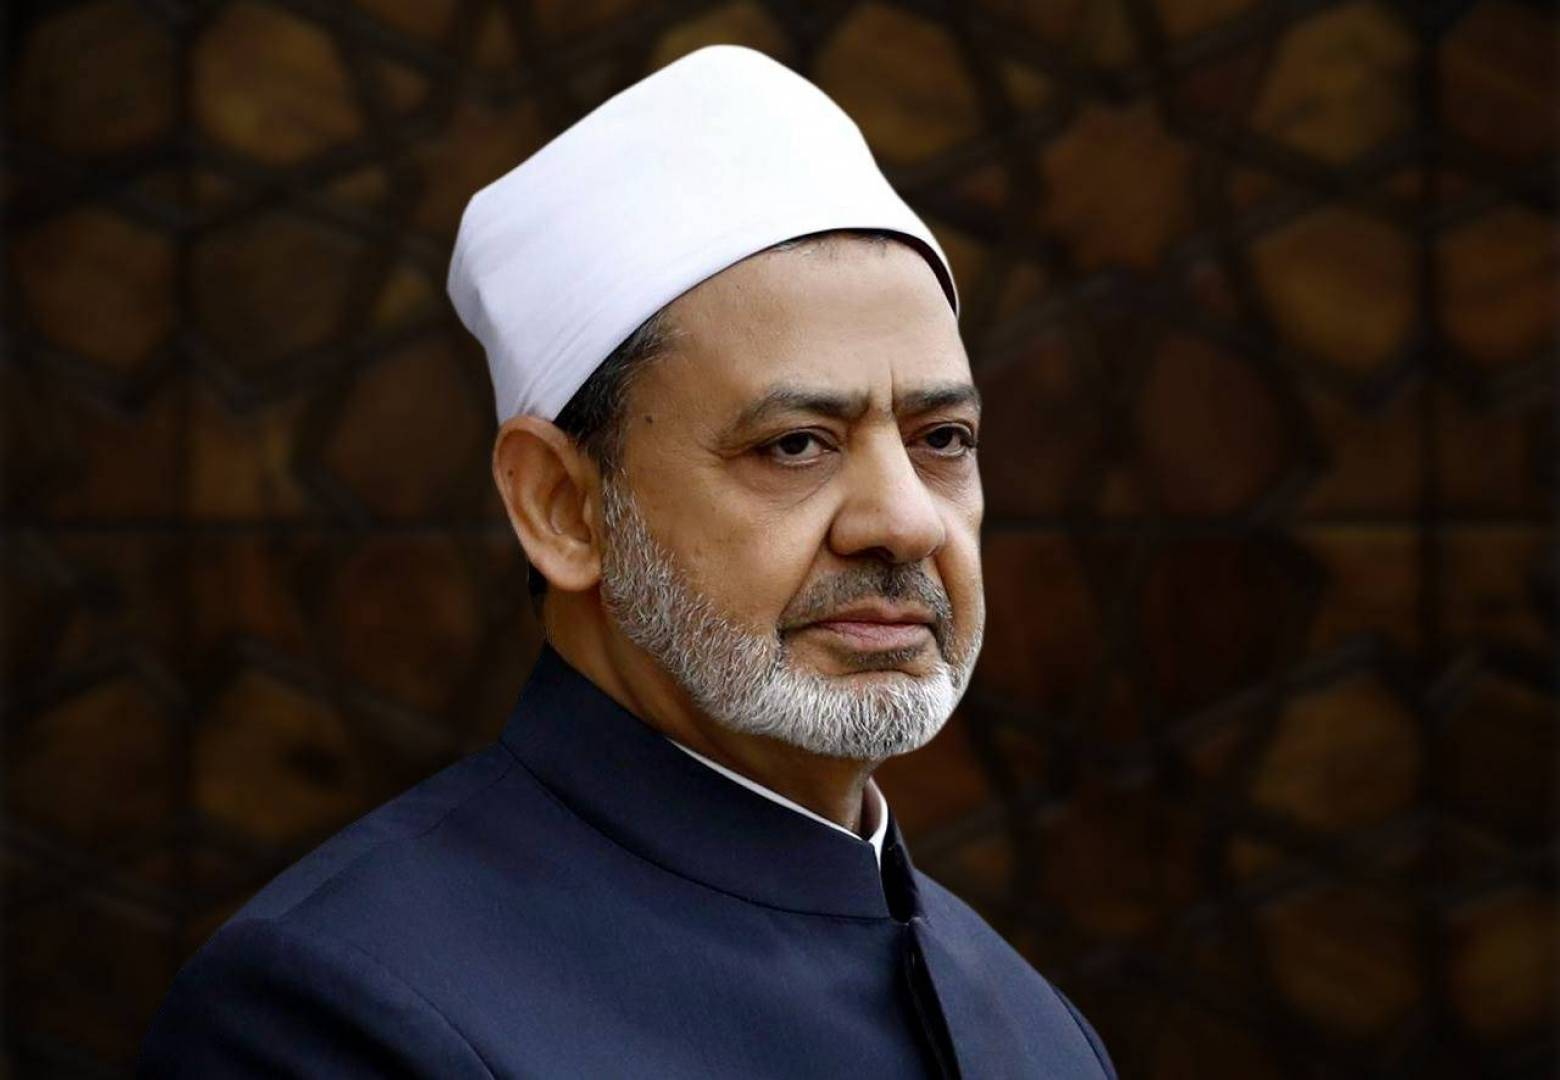 Al Azhar Grand Imam, Dr Ahmed Al-Tayeb